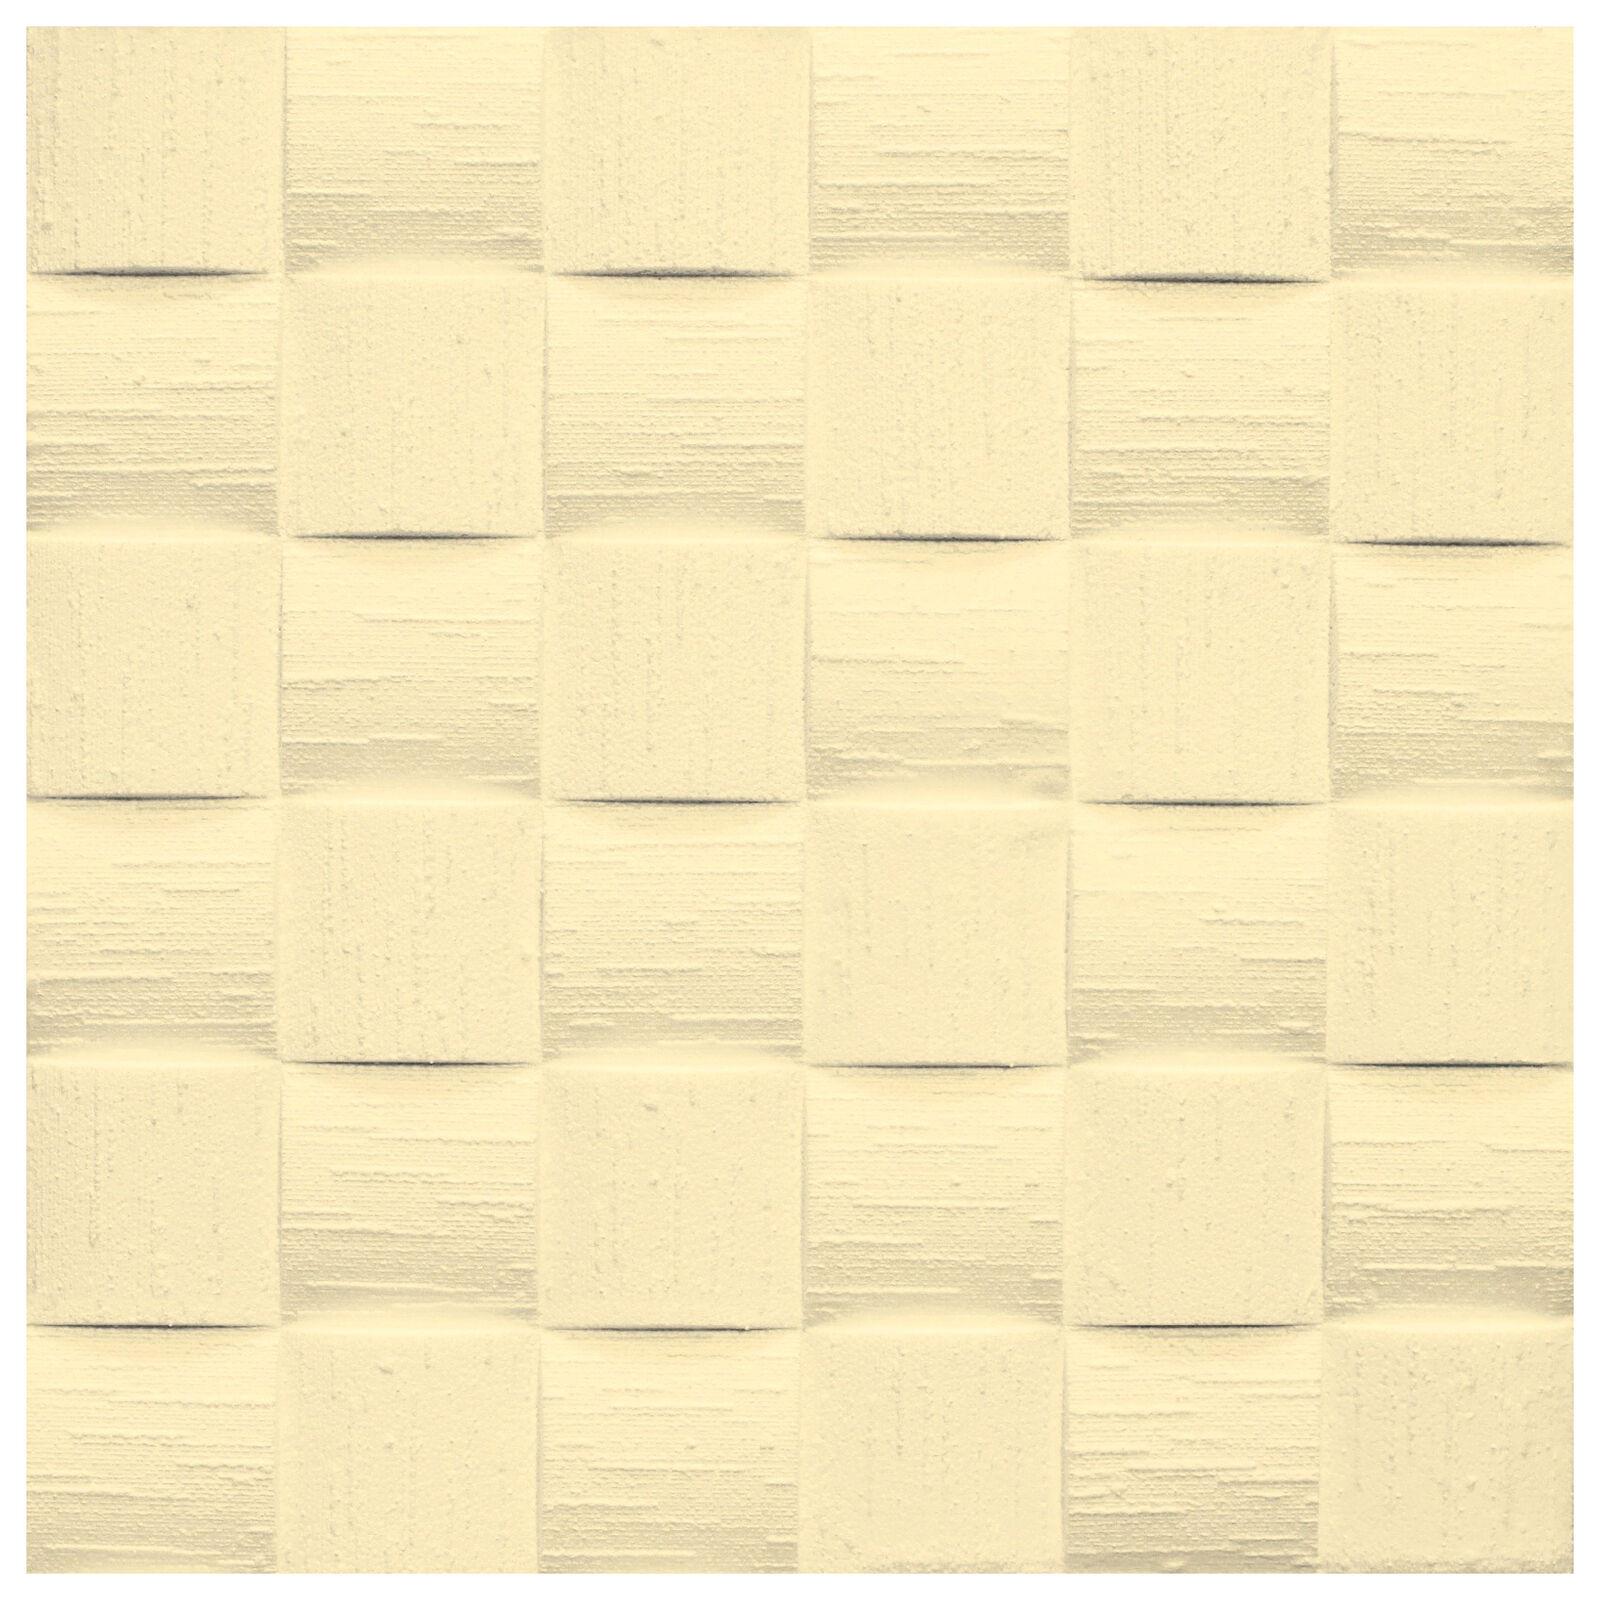 LEN GELB 20 m2 Deckenplatten Styroporplatten Stuck Decke Dekor Platten 50x50cm